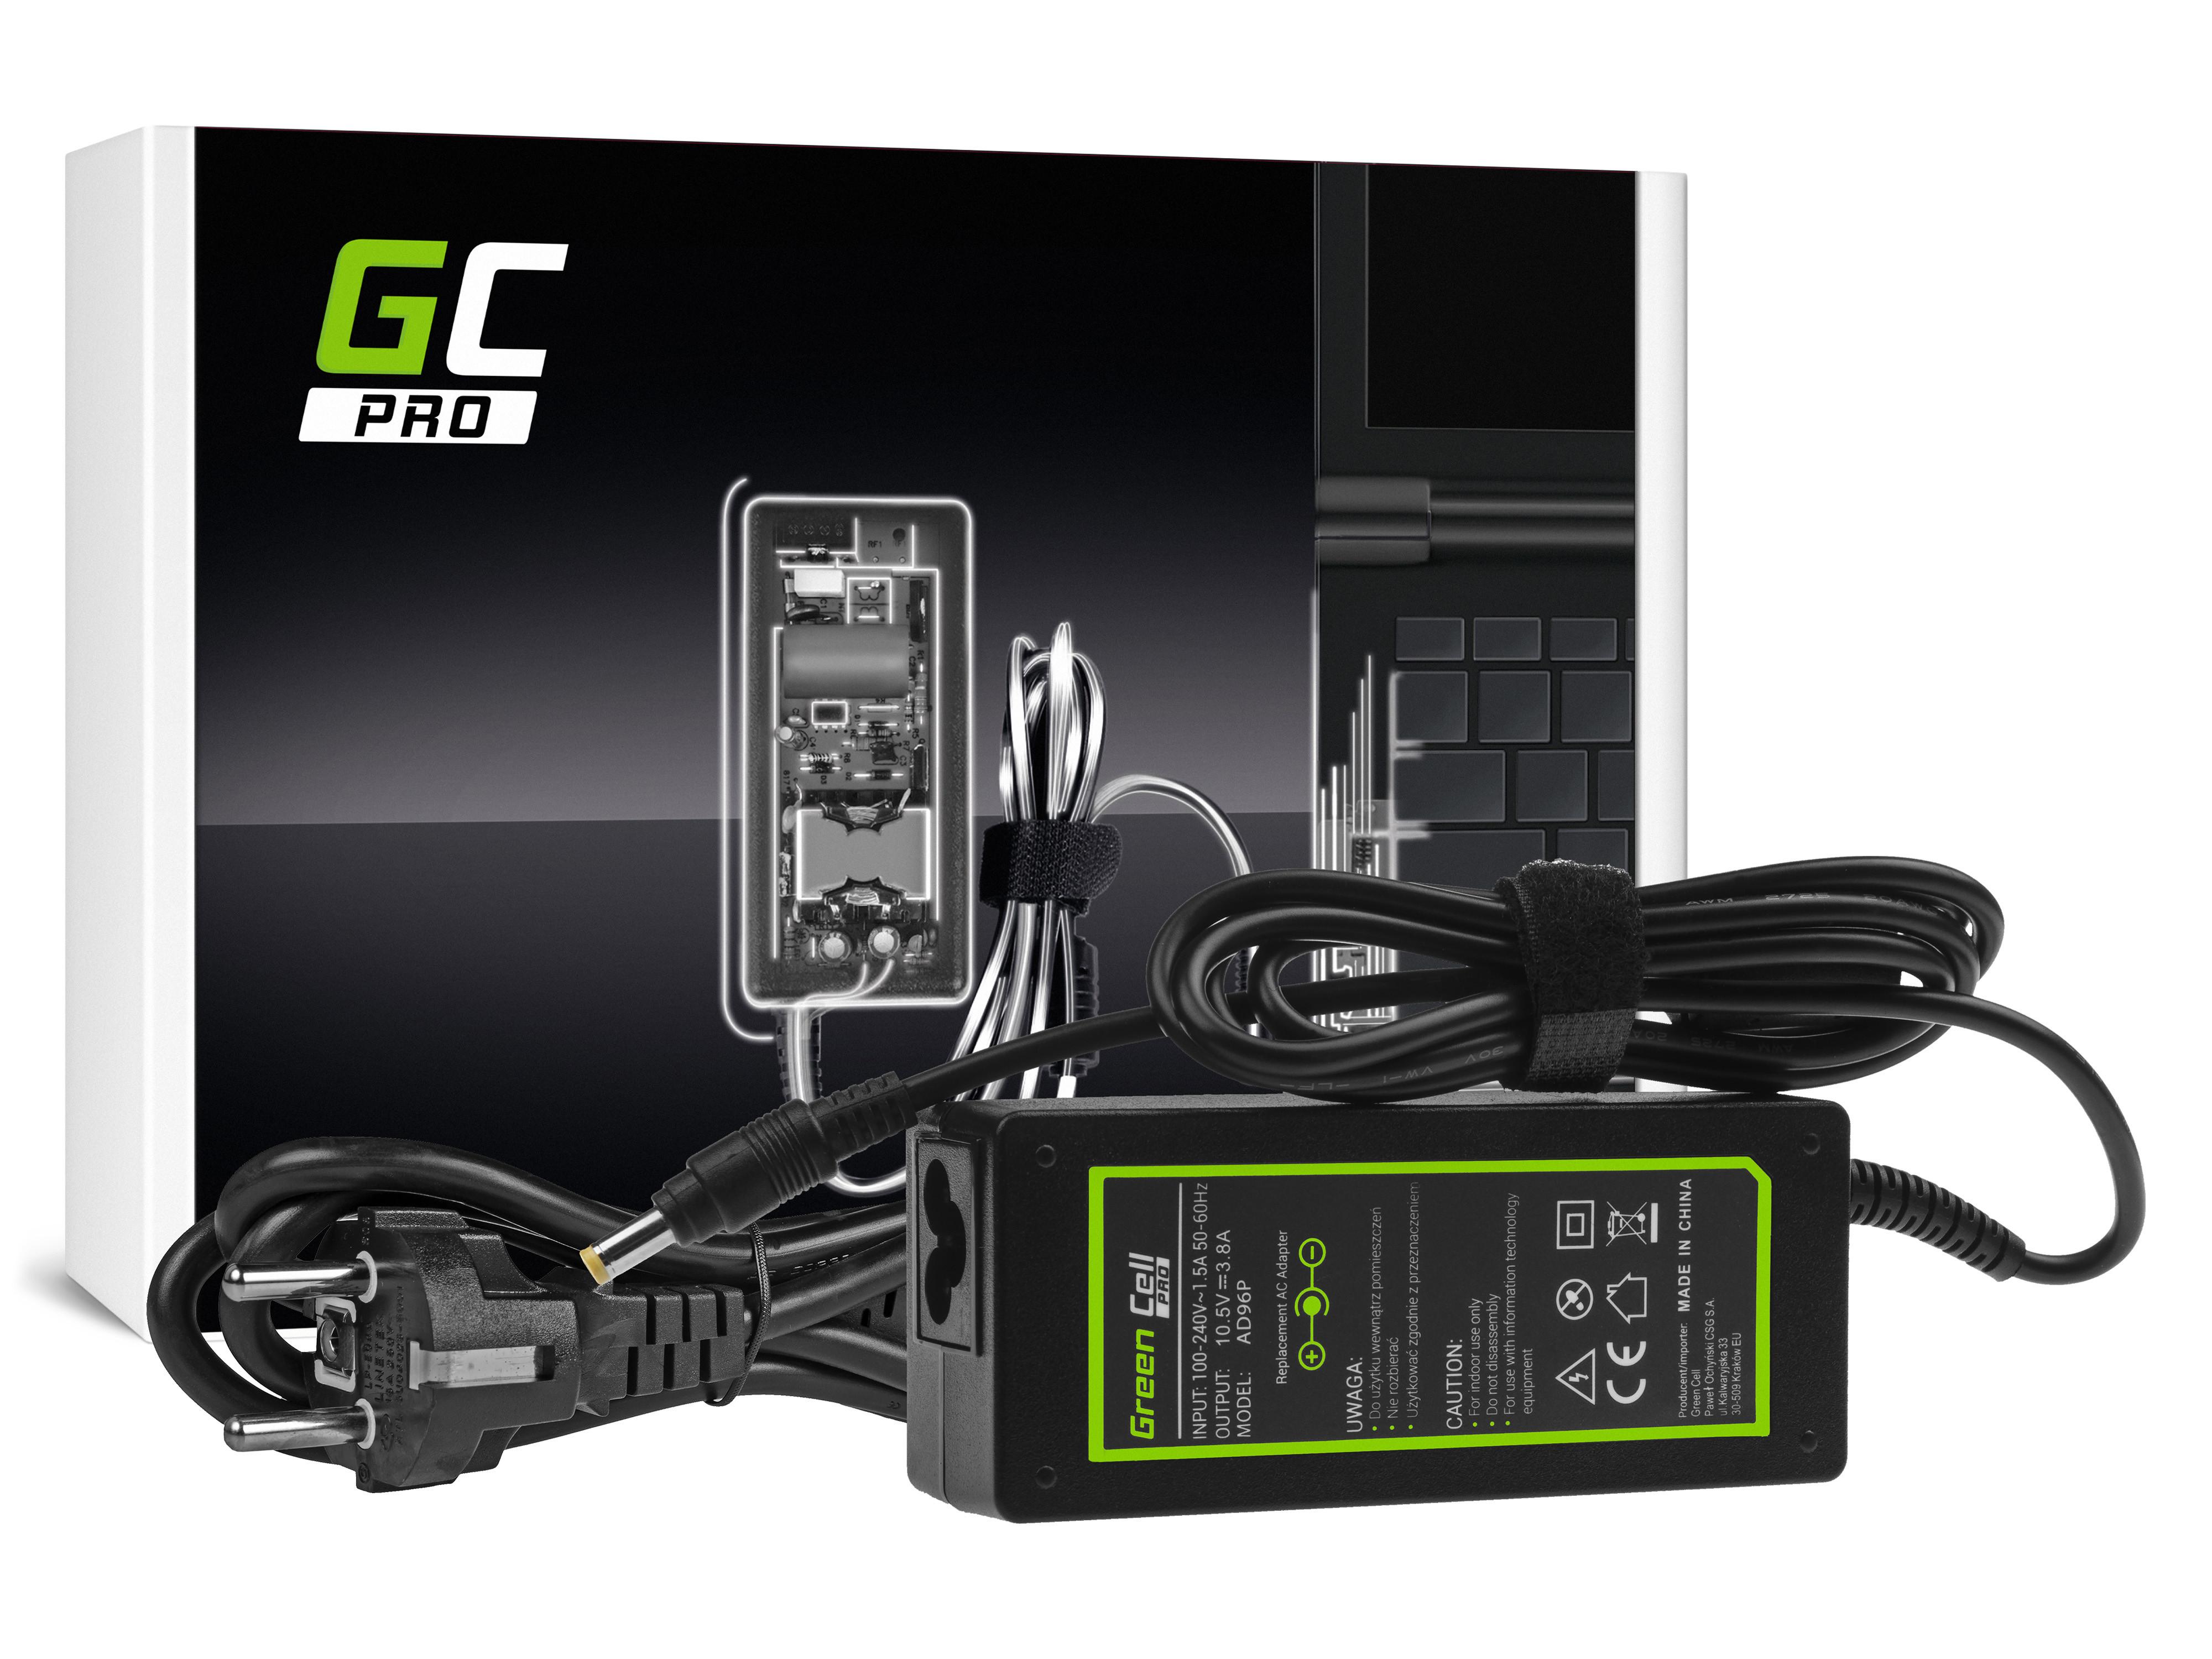 Green Cell AD96P Adaptér Sony VGP-AC10V10 pro Sony Vaio S13 SVS13, Sony Vaio Pro 11 13, Sony Vaio Duo 11 13 | 10.5V 3.8A 40W | konektor 4.8mm-1.7mm